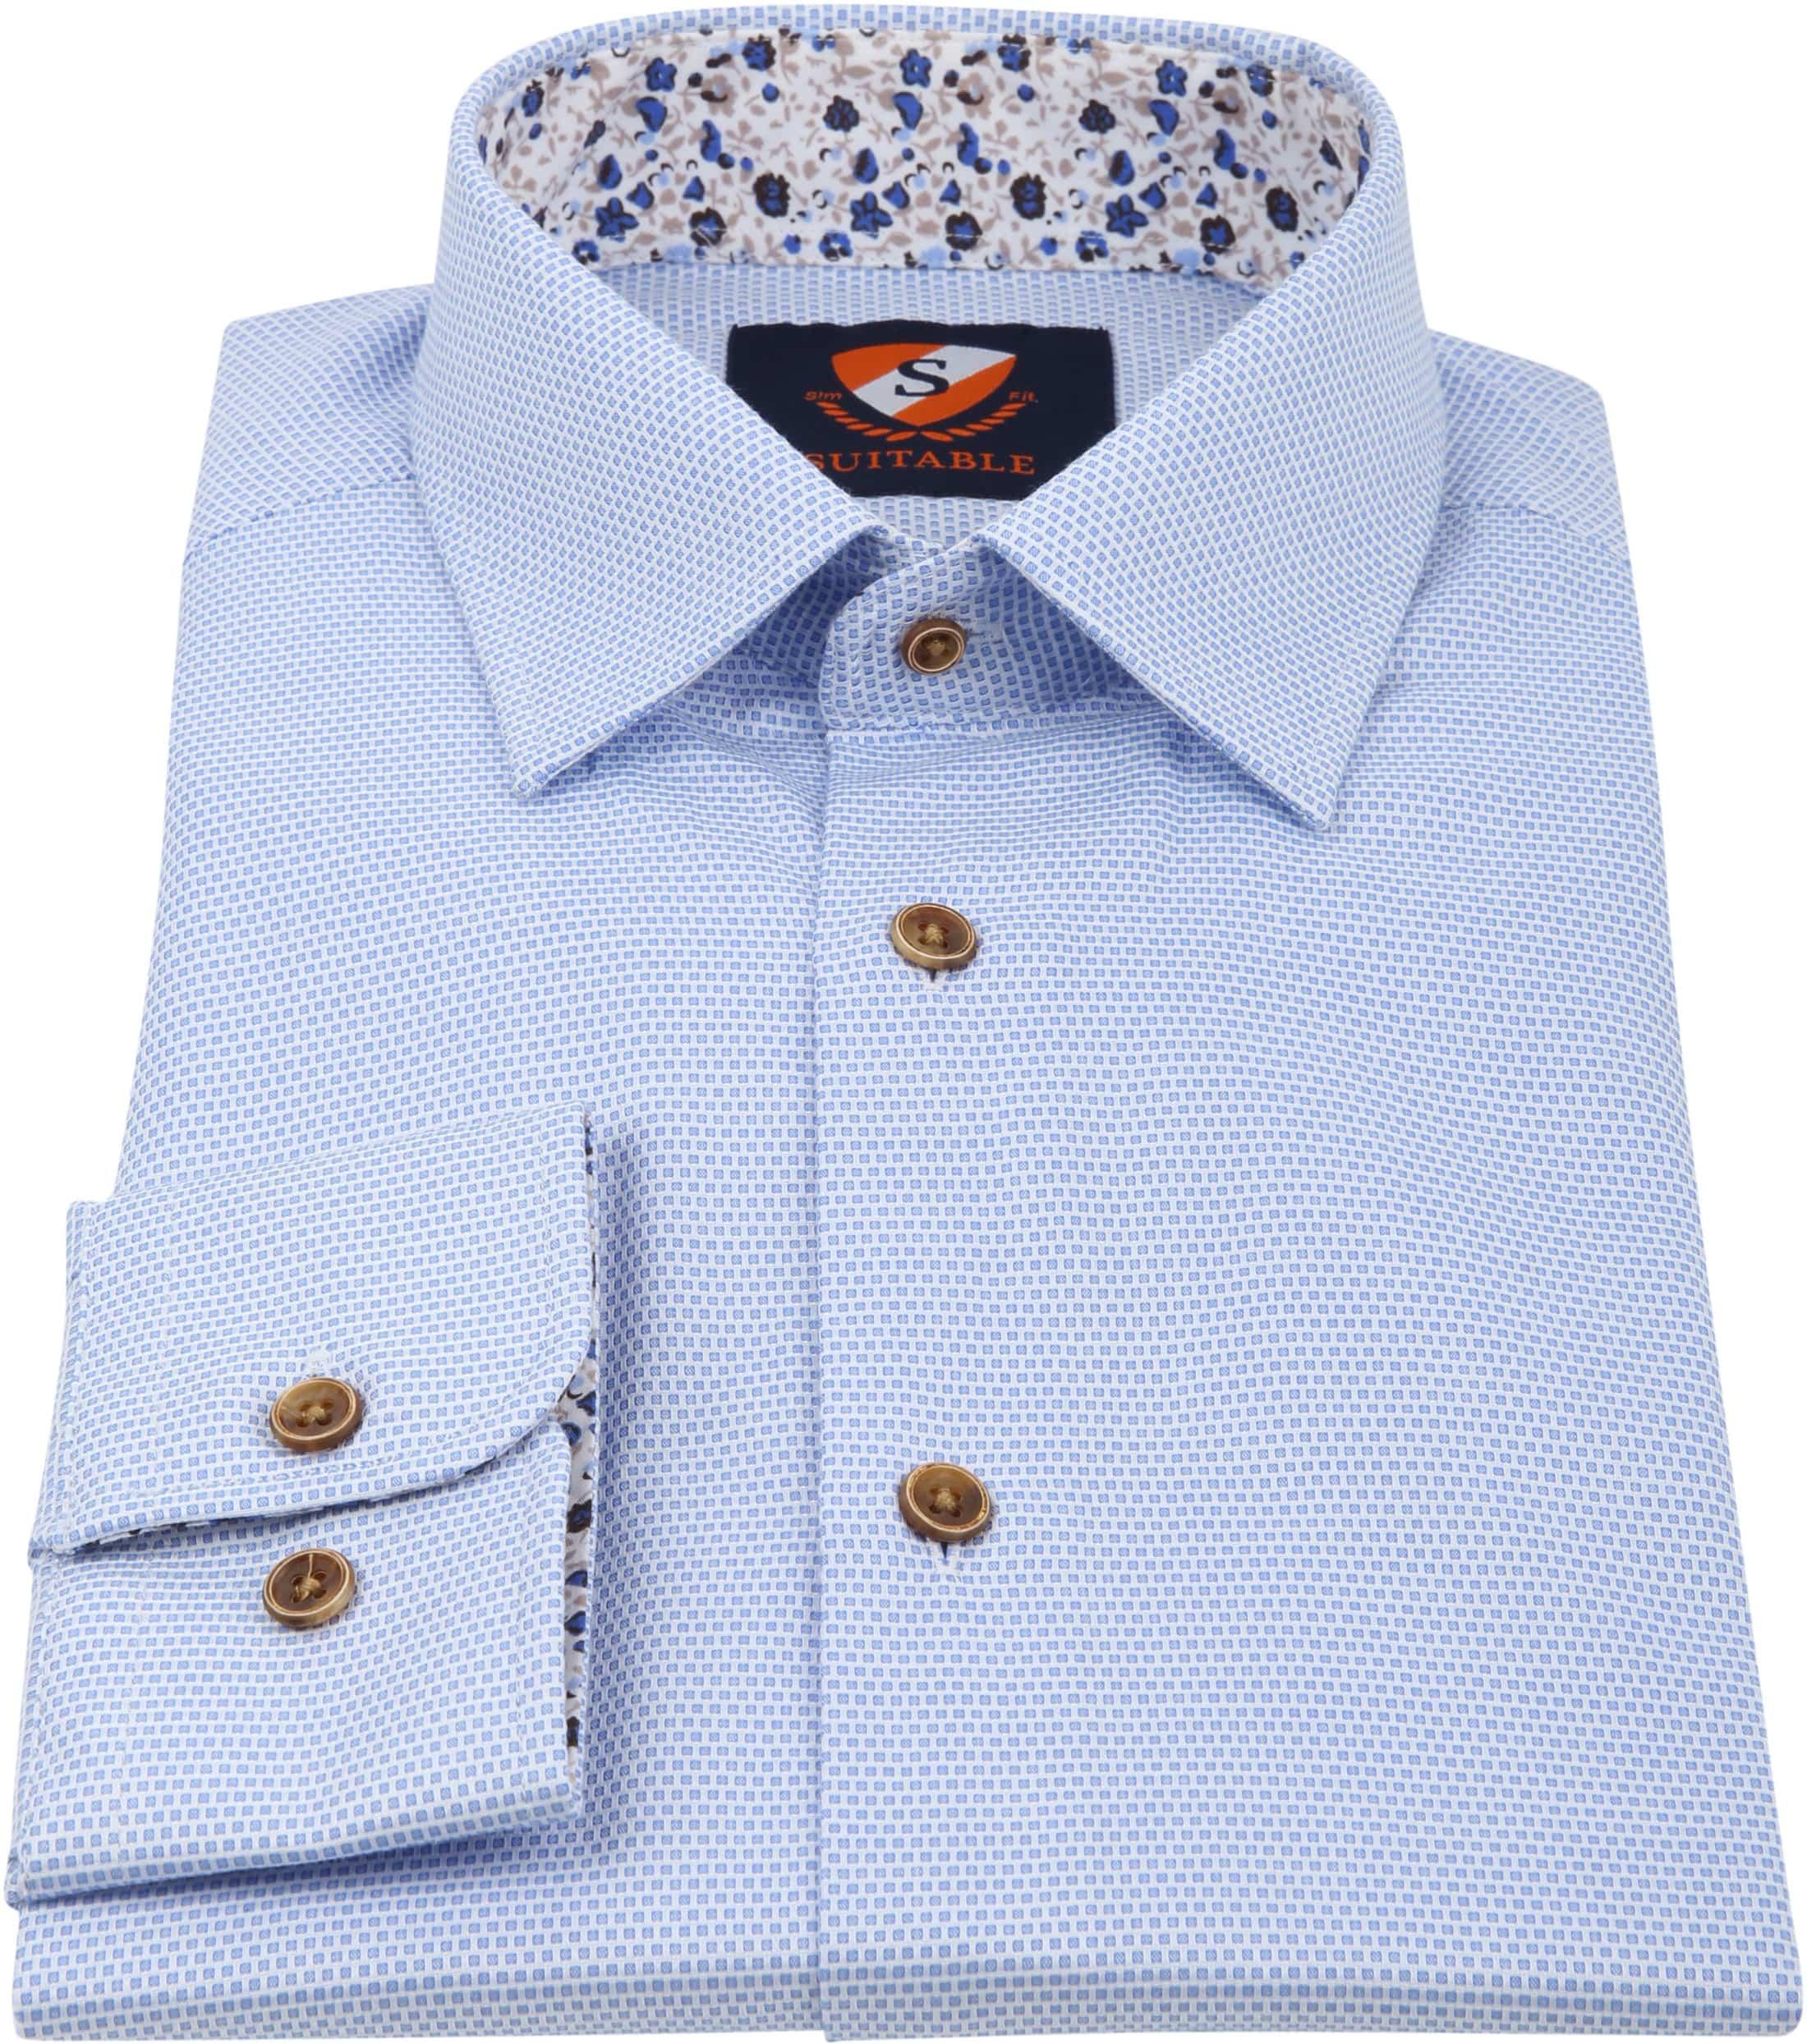 Suitable Overhemd HBD Lichtblauw Wesley foto 2